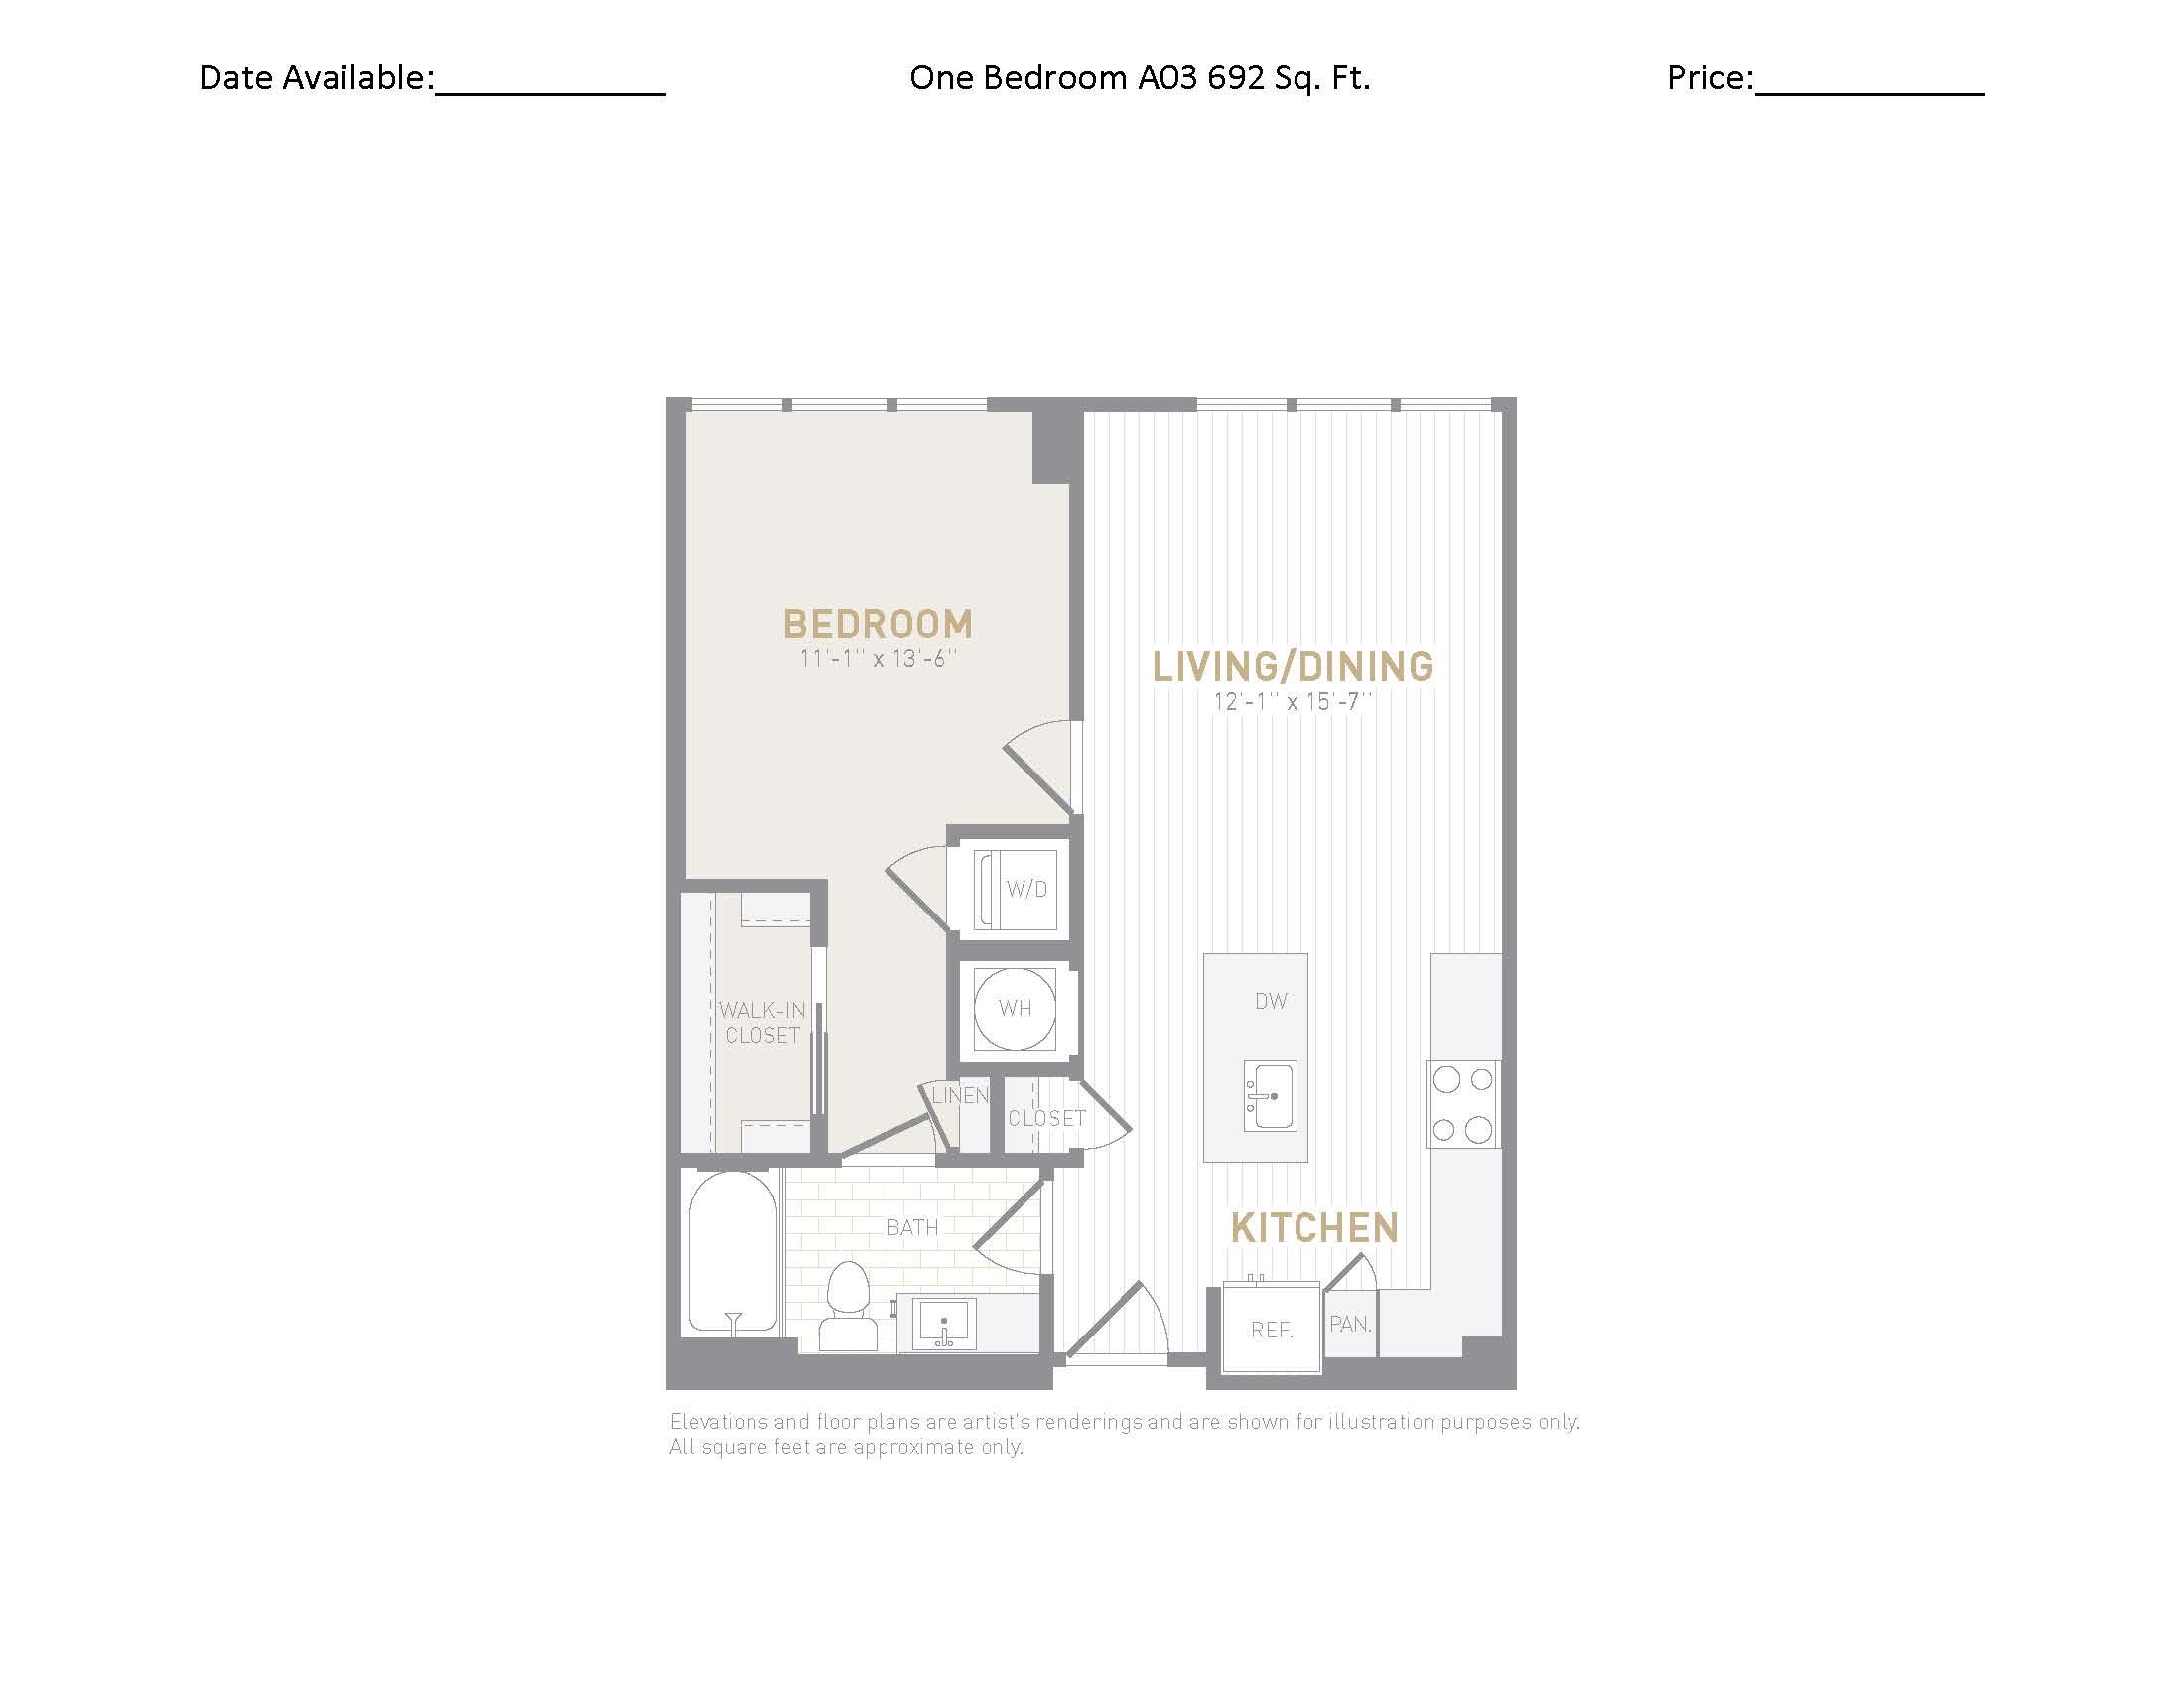 floor image of unit 0210